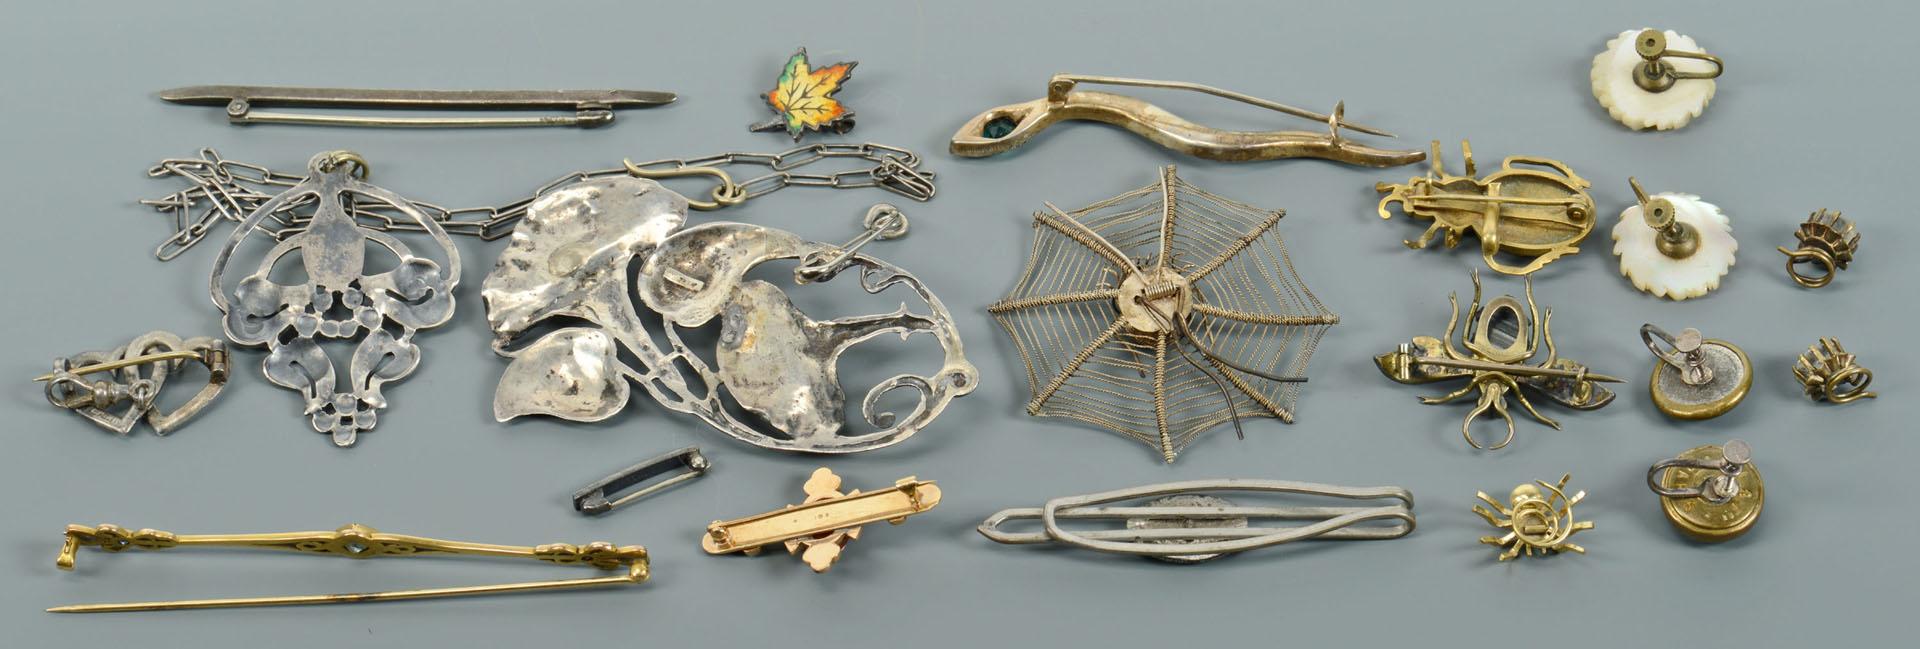 17 pcs vintage jewelry inc. 10K cameo, bugs, snake